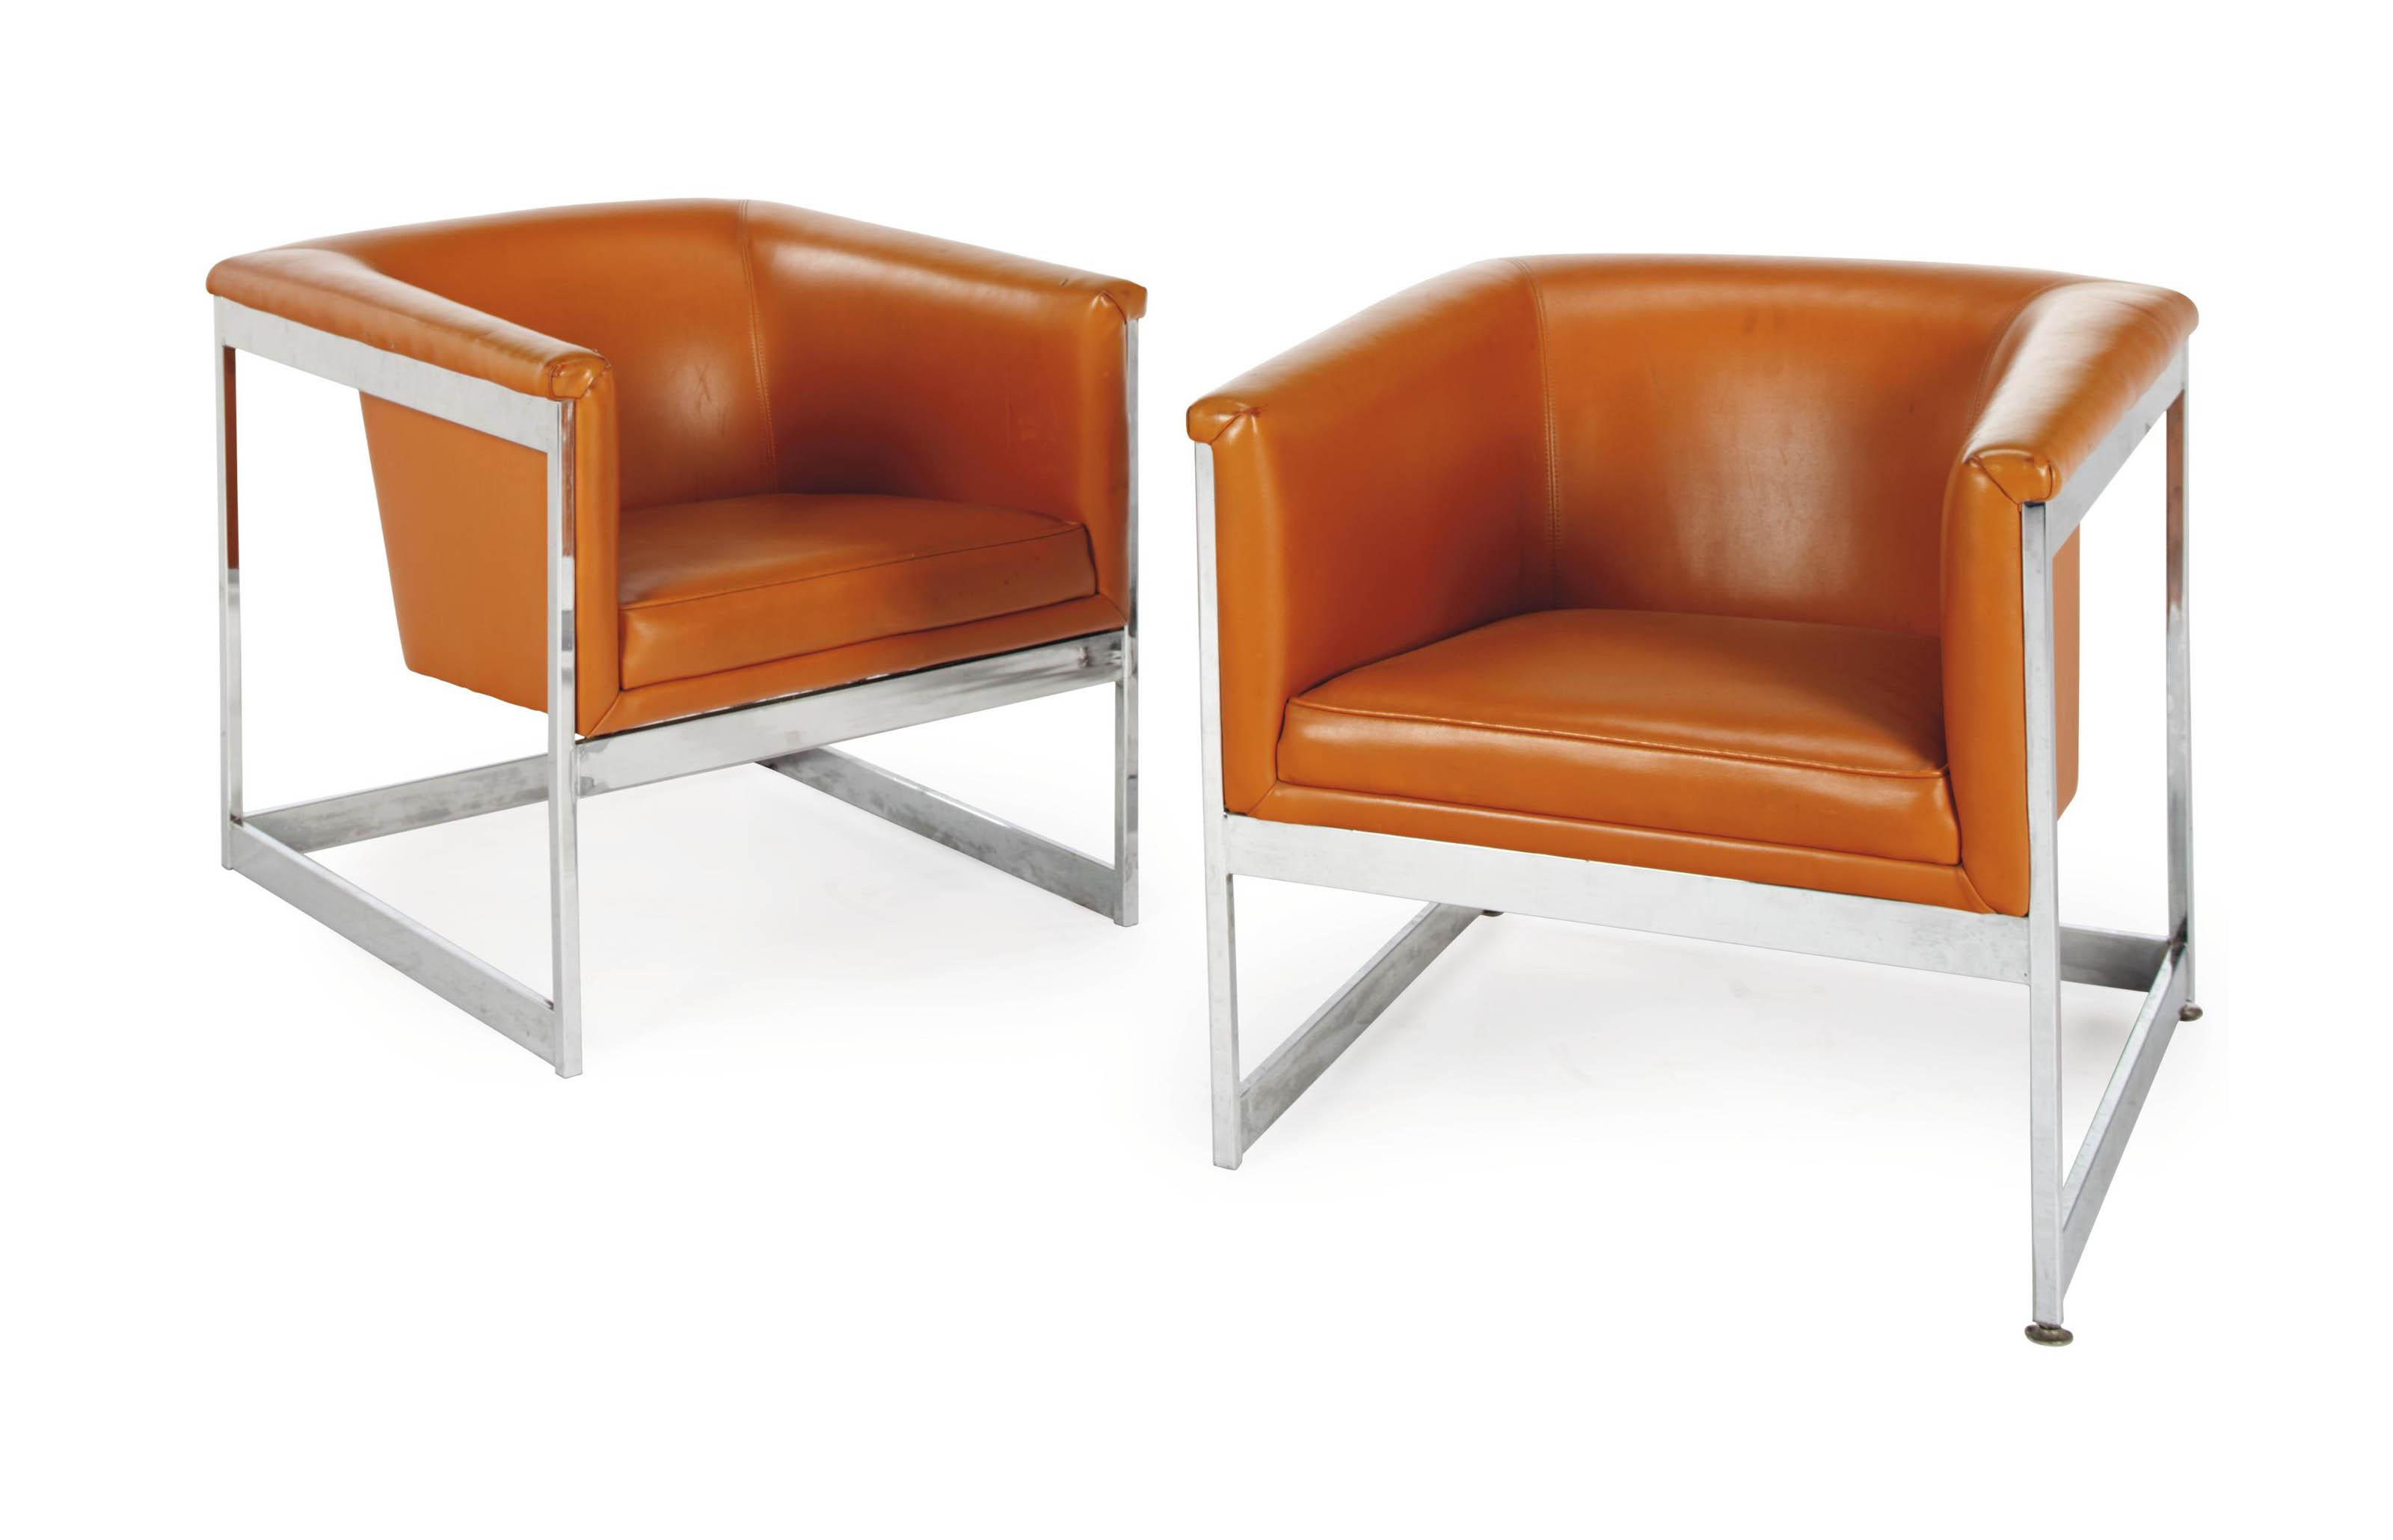 Terrific A Pair Of Orange Leather And Silver Metal Club Chairs Machost Co Dining Chair Design Ideas Machostcouk